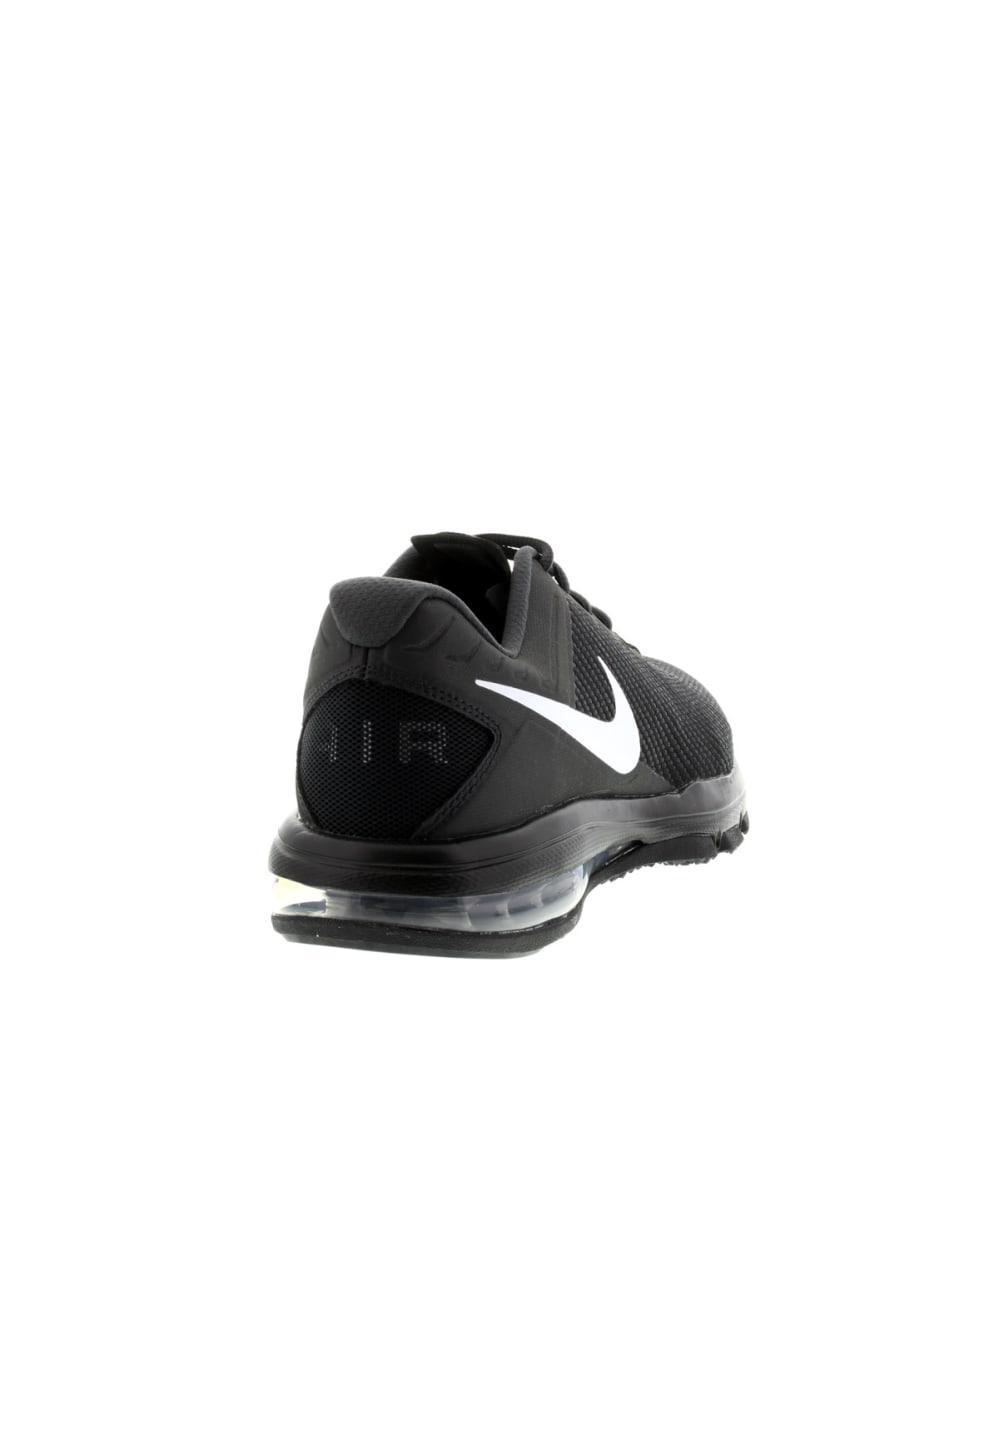 new product 7cd29 46a2f Next. Nike. Air Max Full Ride TR 1.5 - Fitnessschuhe für Herren